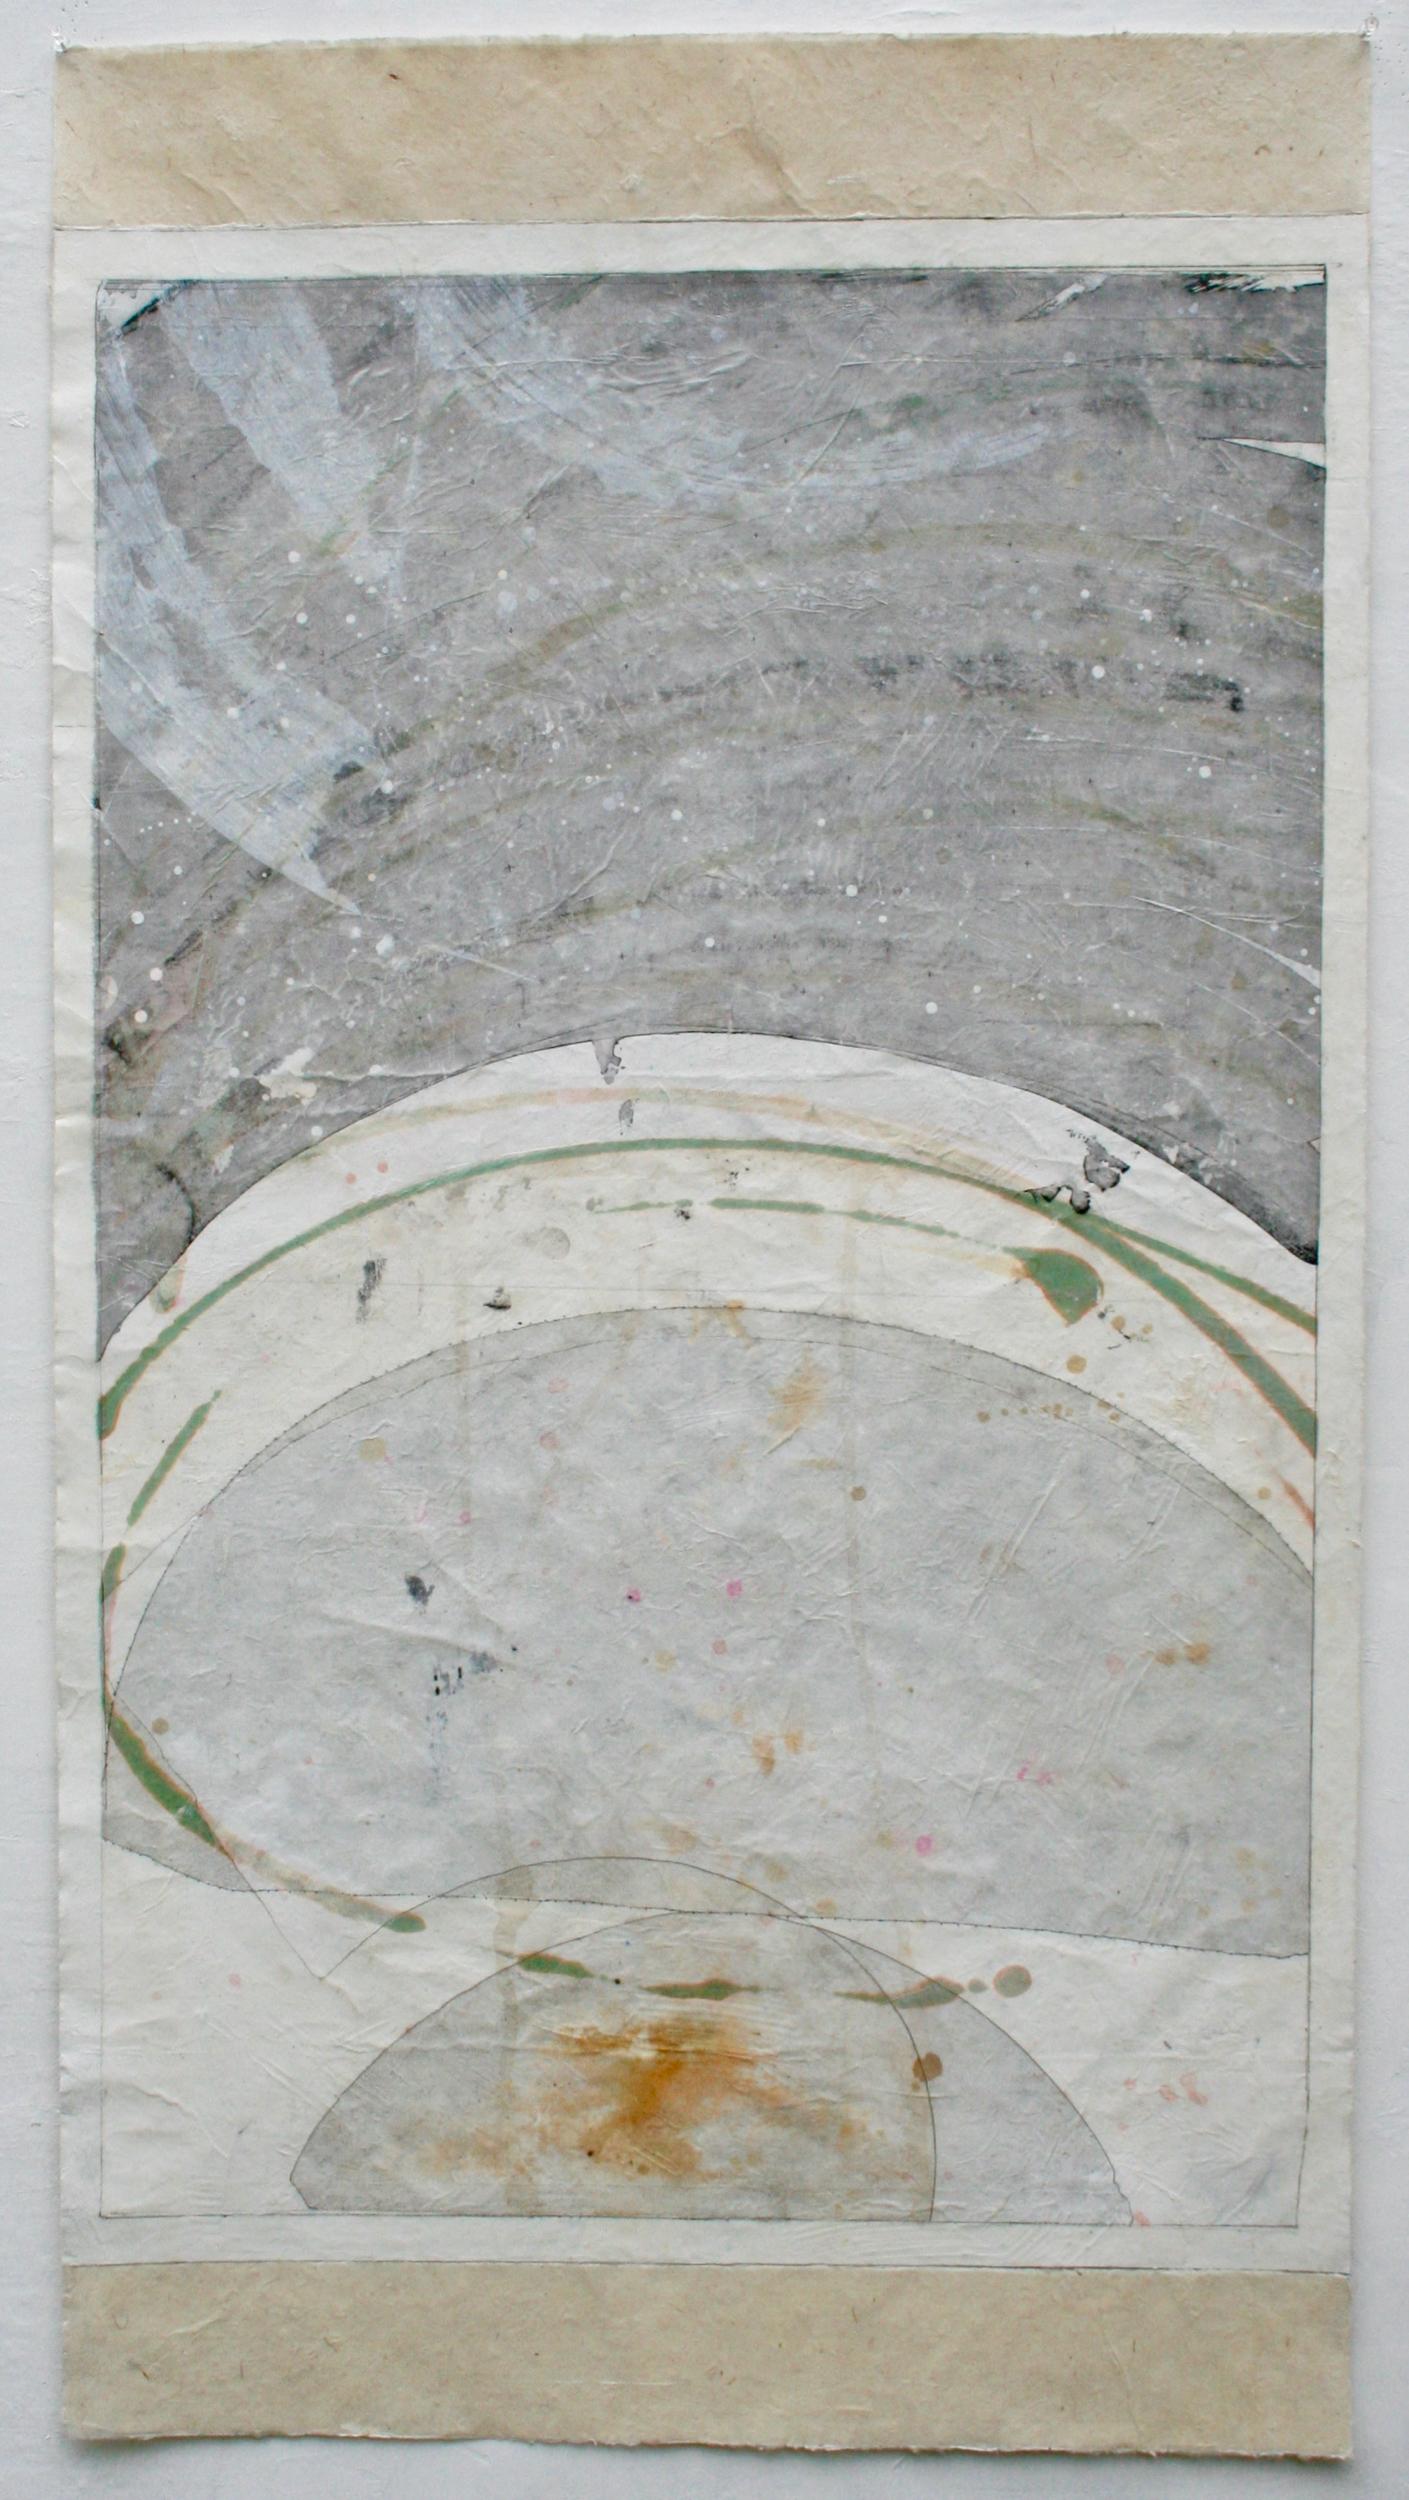 cosmos  mixed media on Tibetan paper  48 x 25.5  .  .  .  .